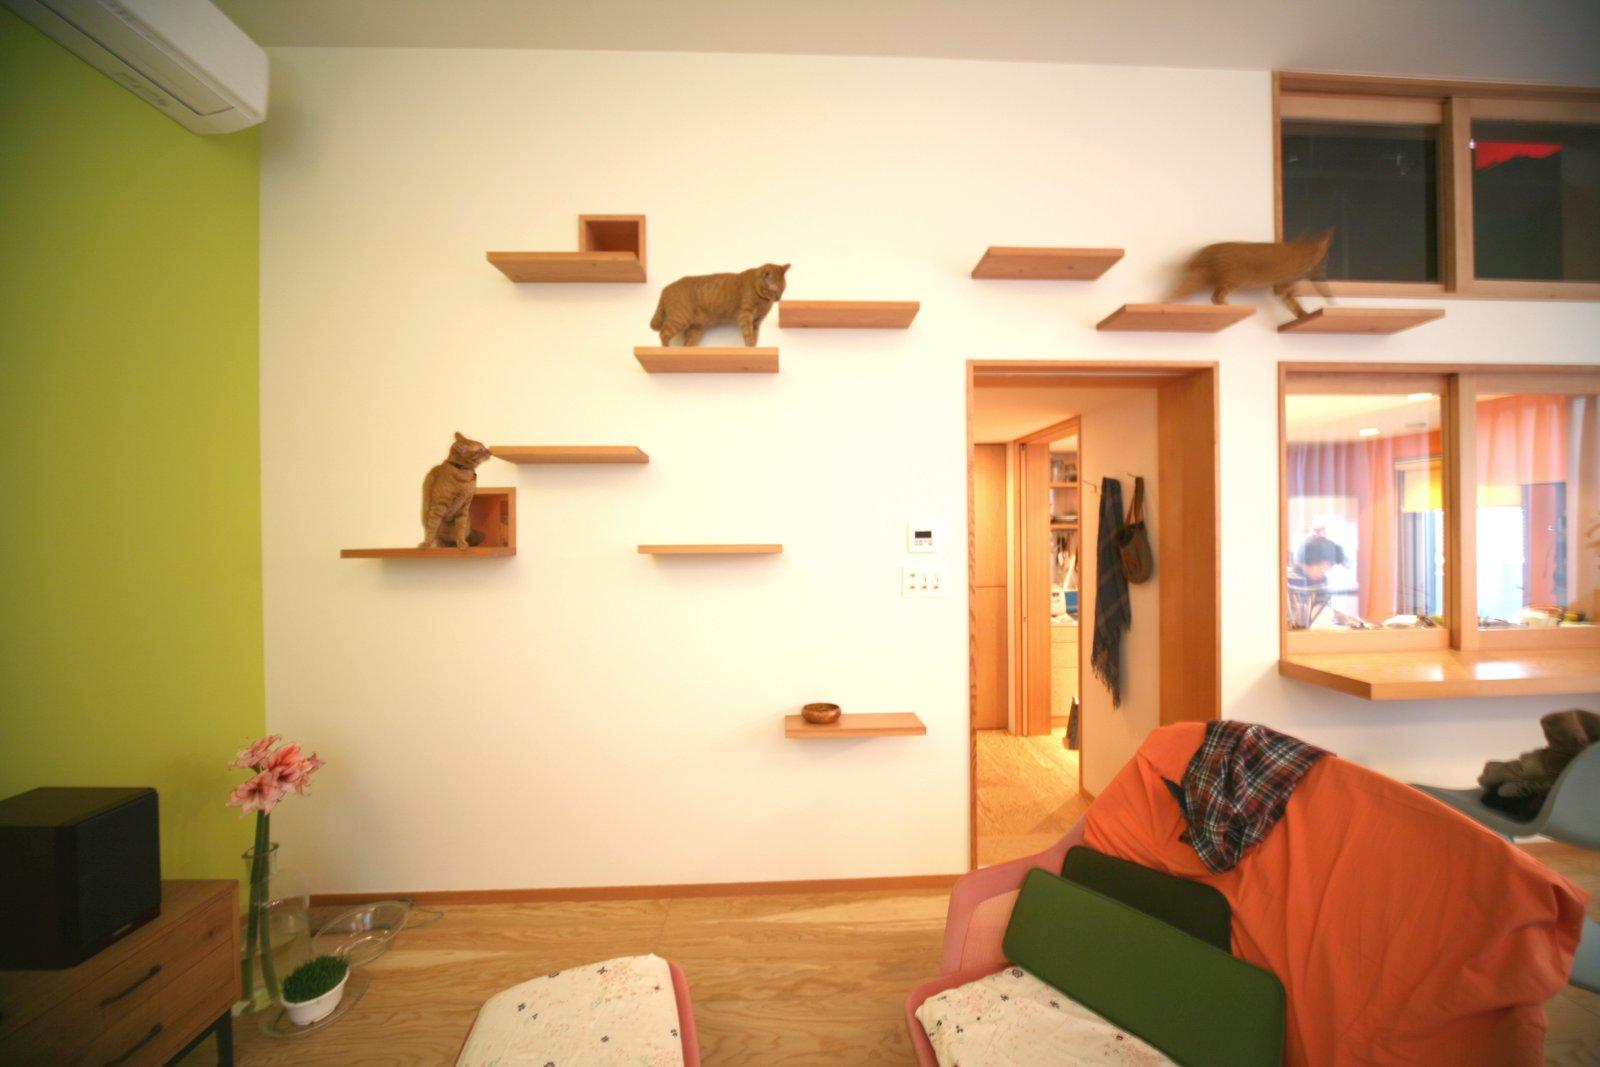 House Taishido living room with shelf steps for cats